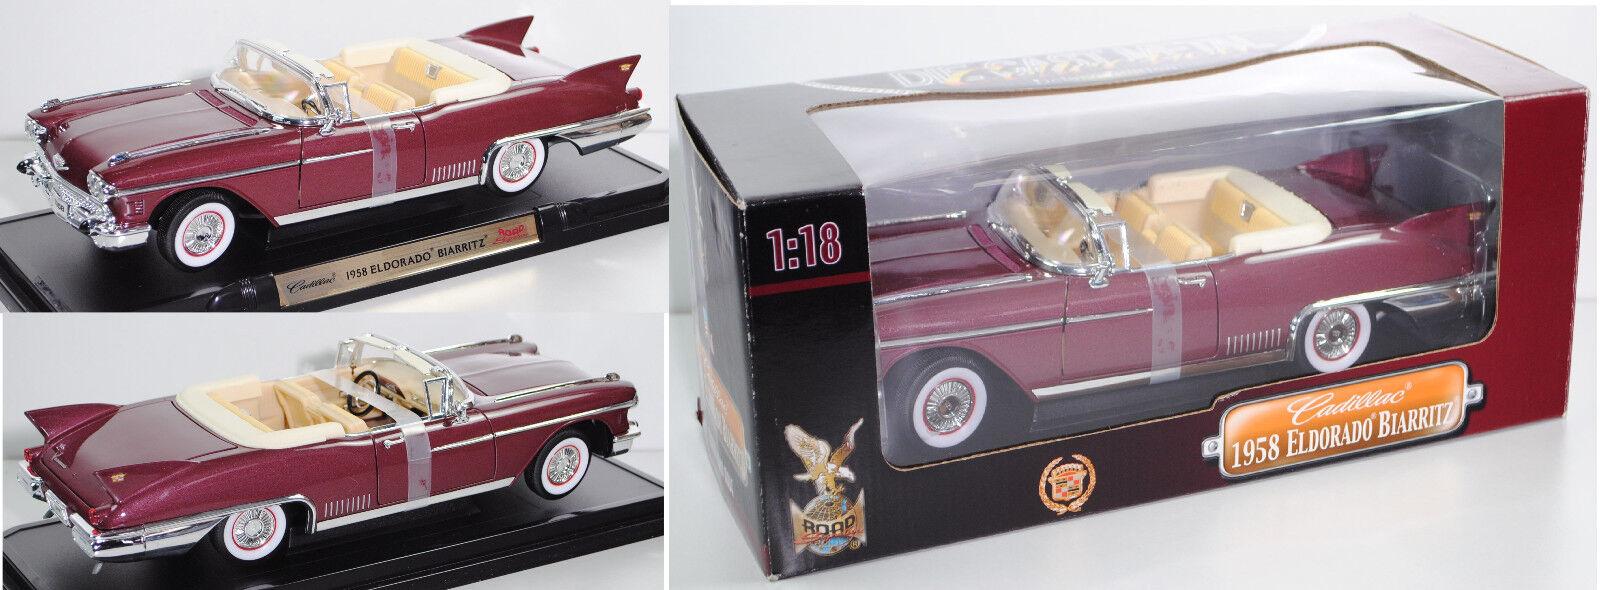 ROAD Signature   Yatming 5510863 Cadillac Eldorado Biarritz, weinred, 1 18